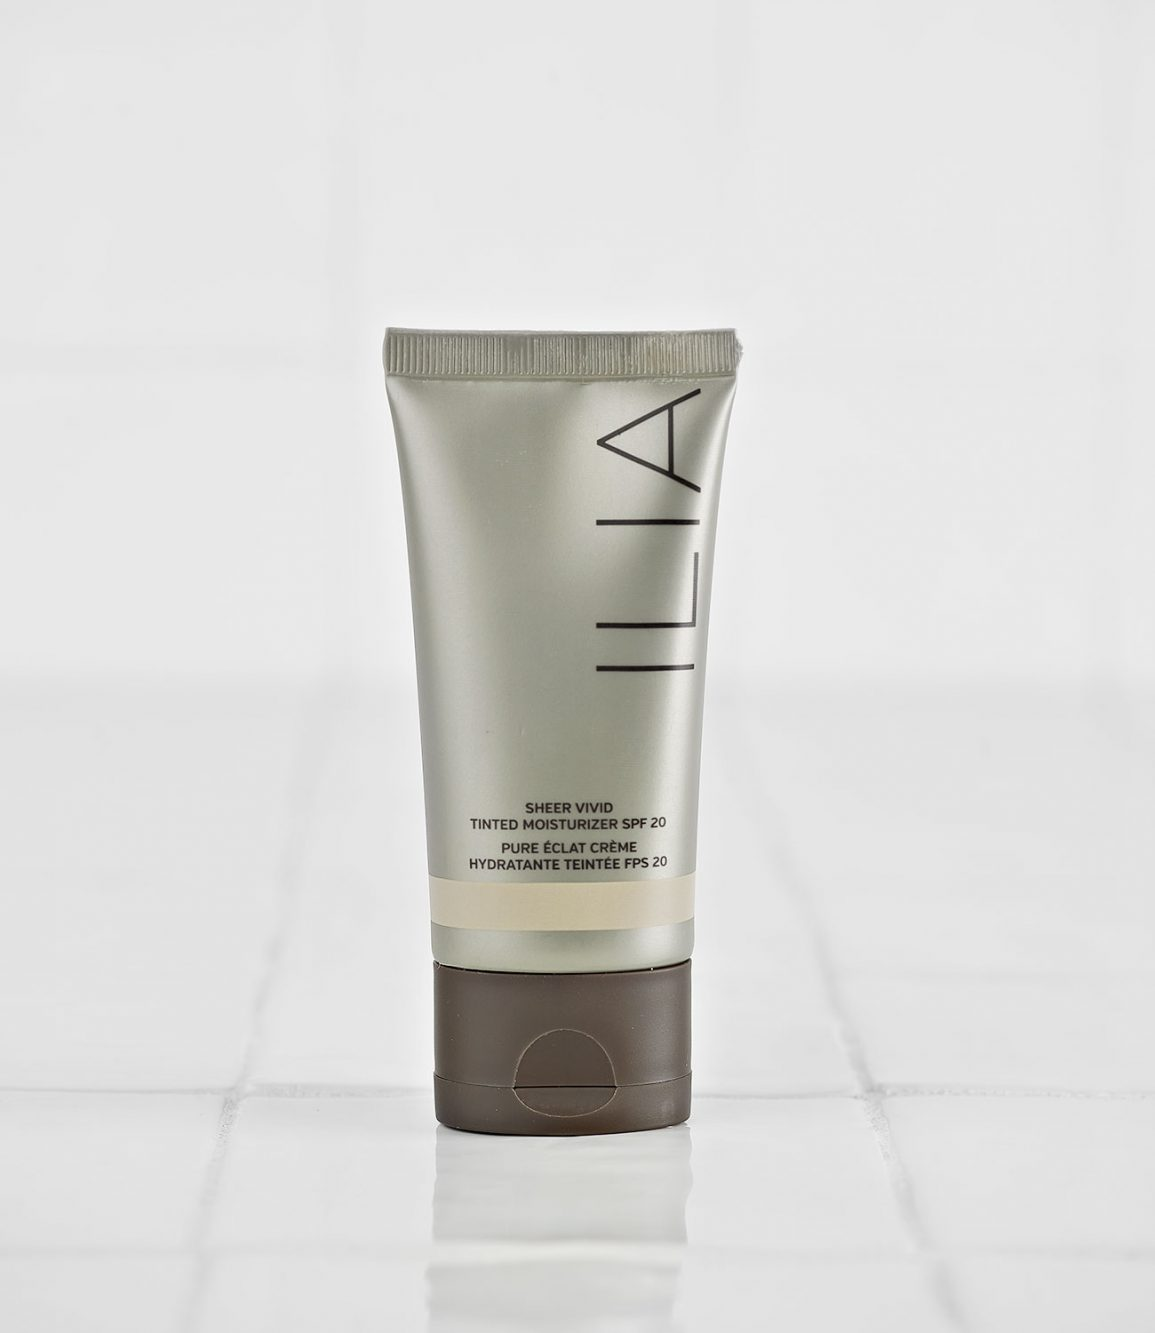 Crème hydratante teintée Ilia - Maquillage naturel